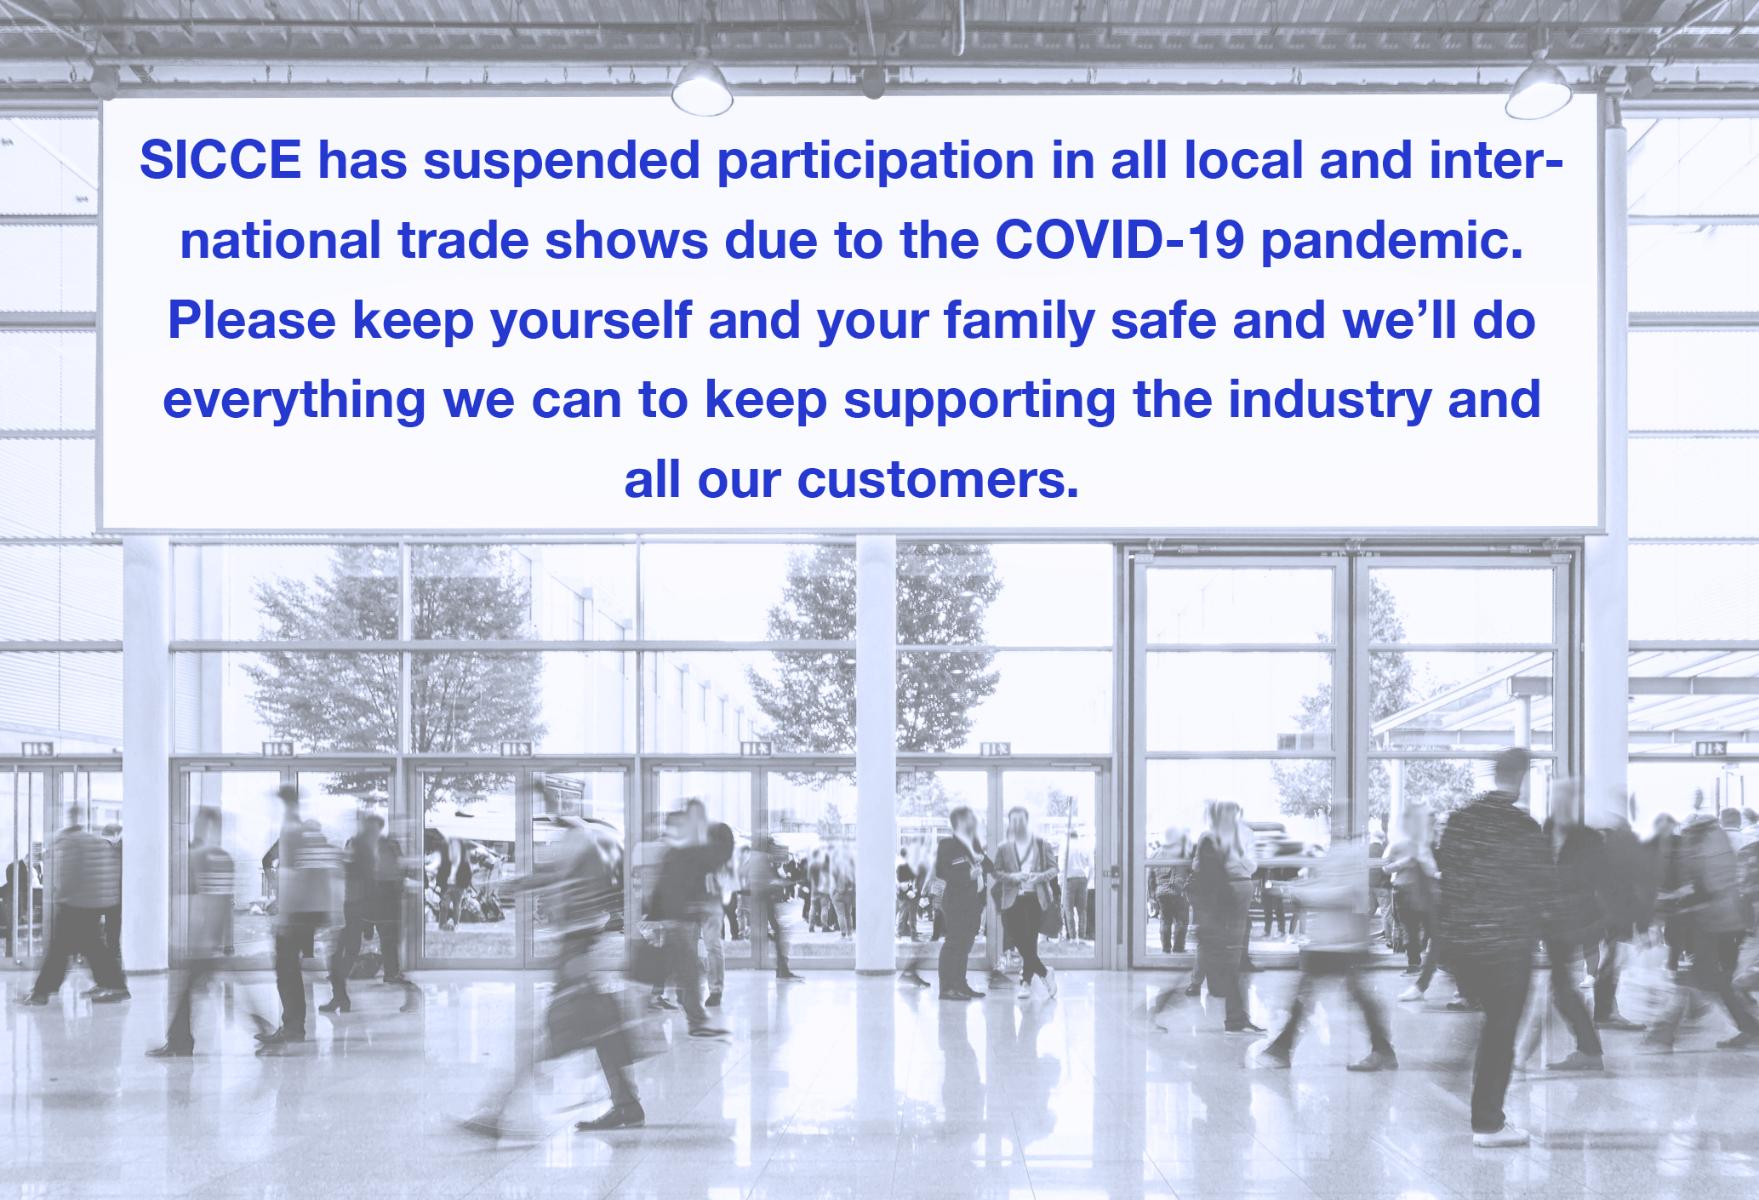 tradeshow suspension